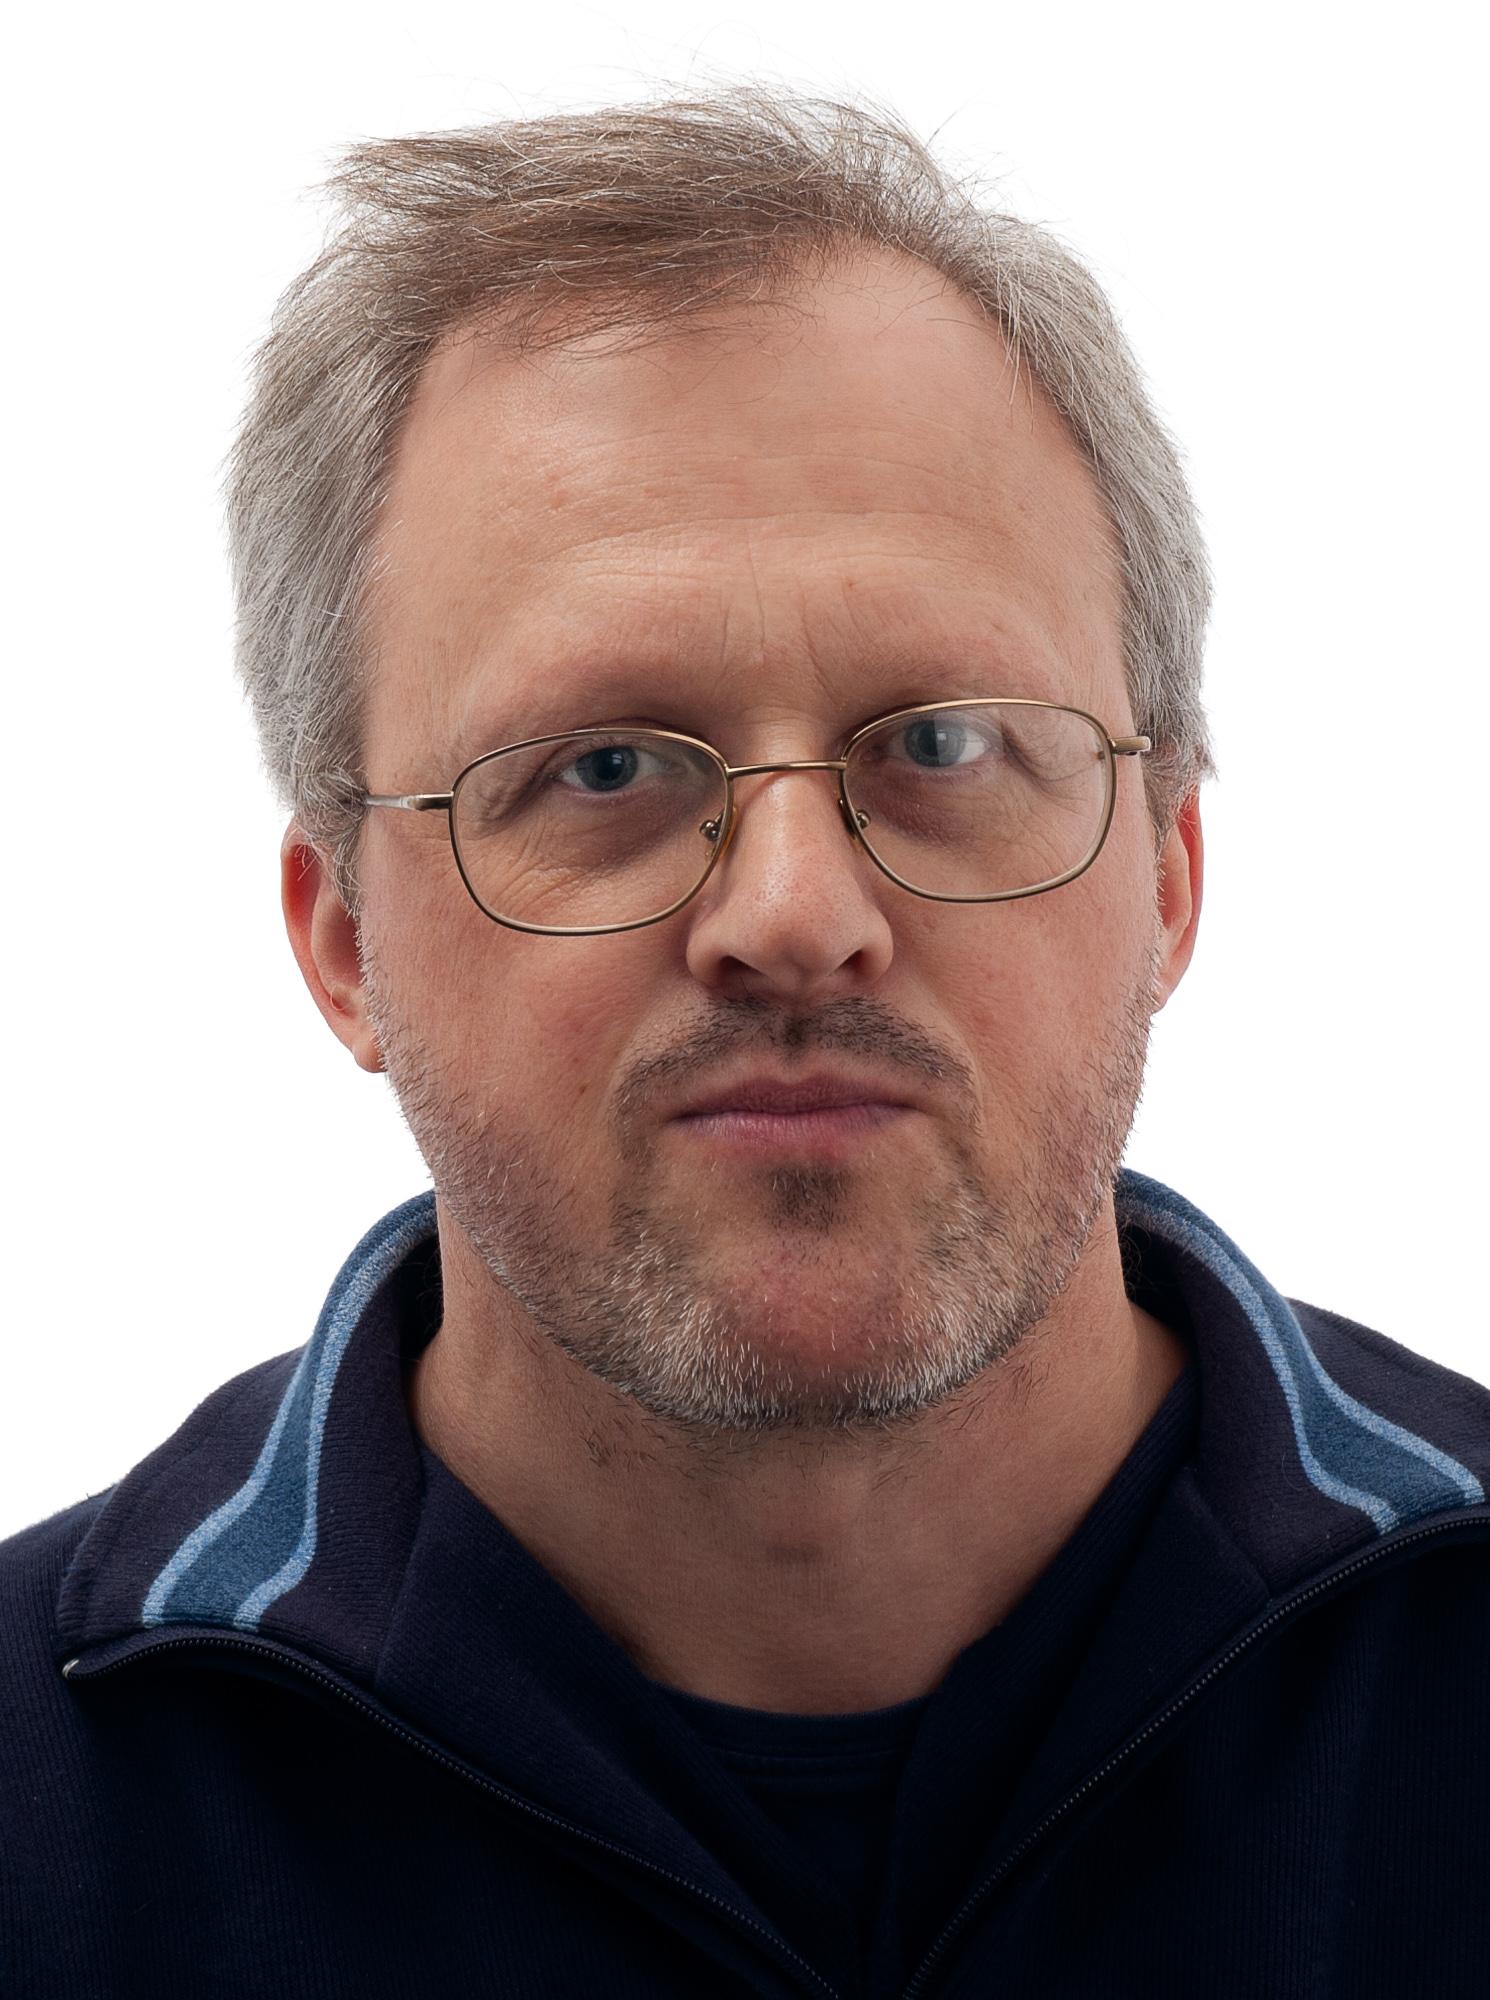 Jonathan P. Merrison